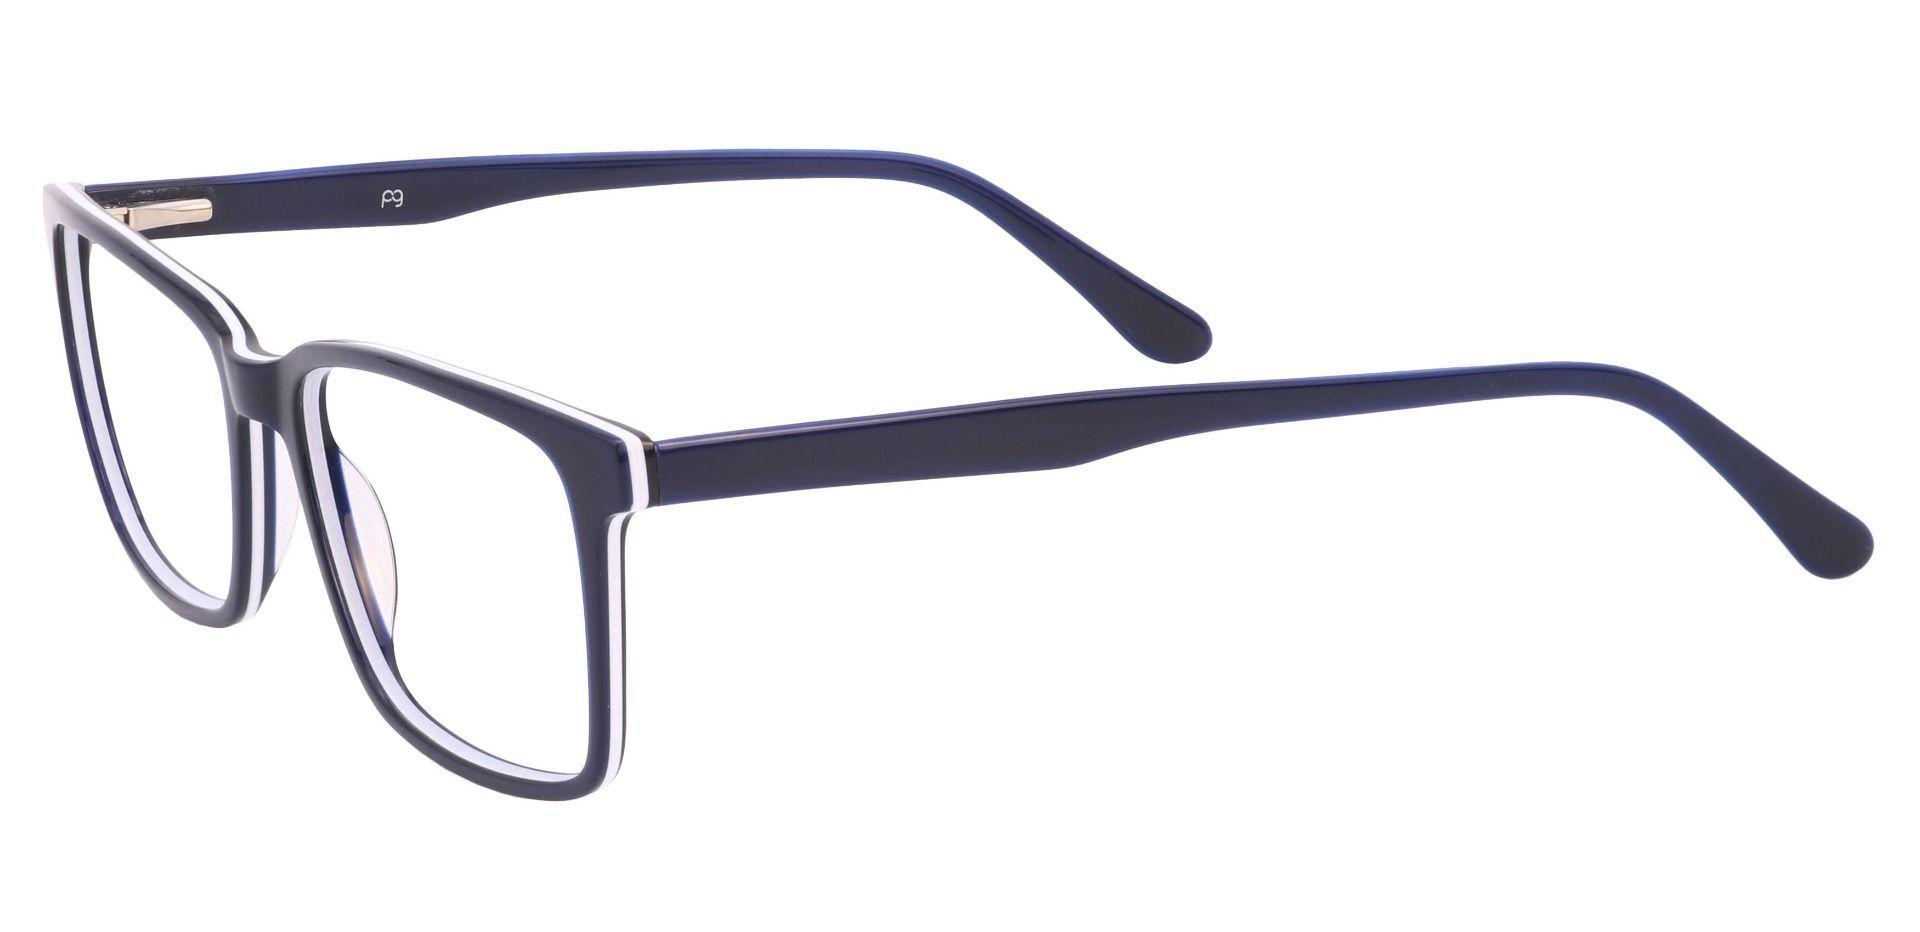 Venice Rectangle Lined Bifocal Glasses - Navy-white